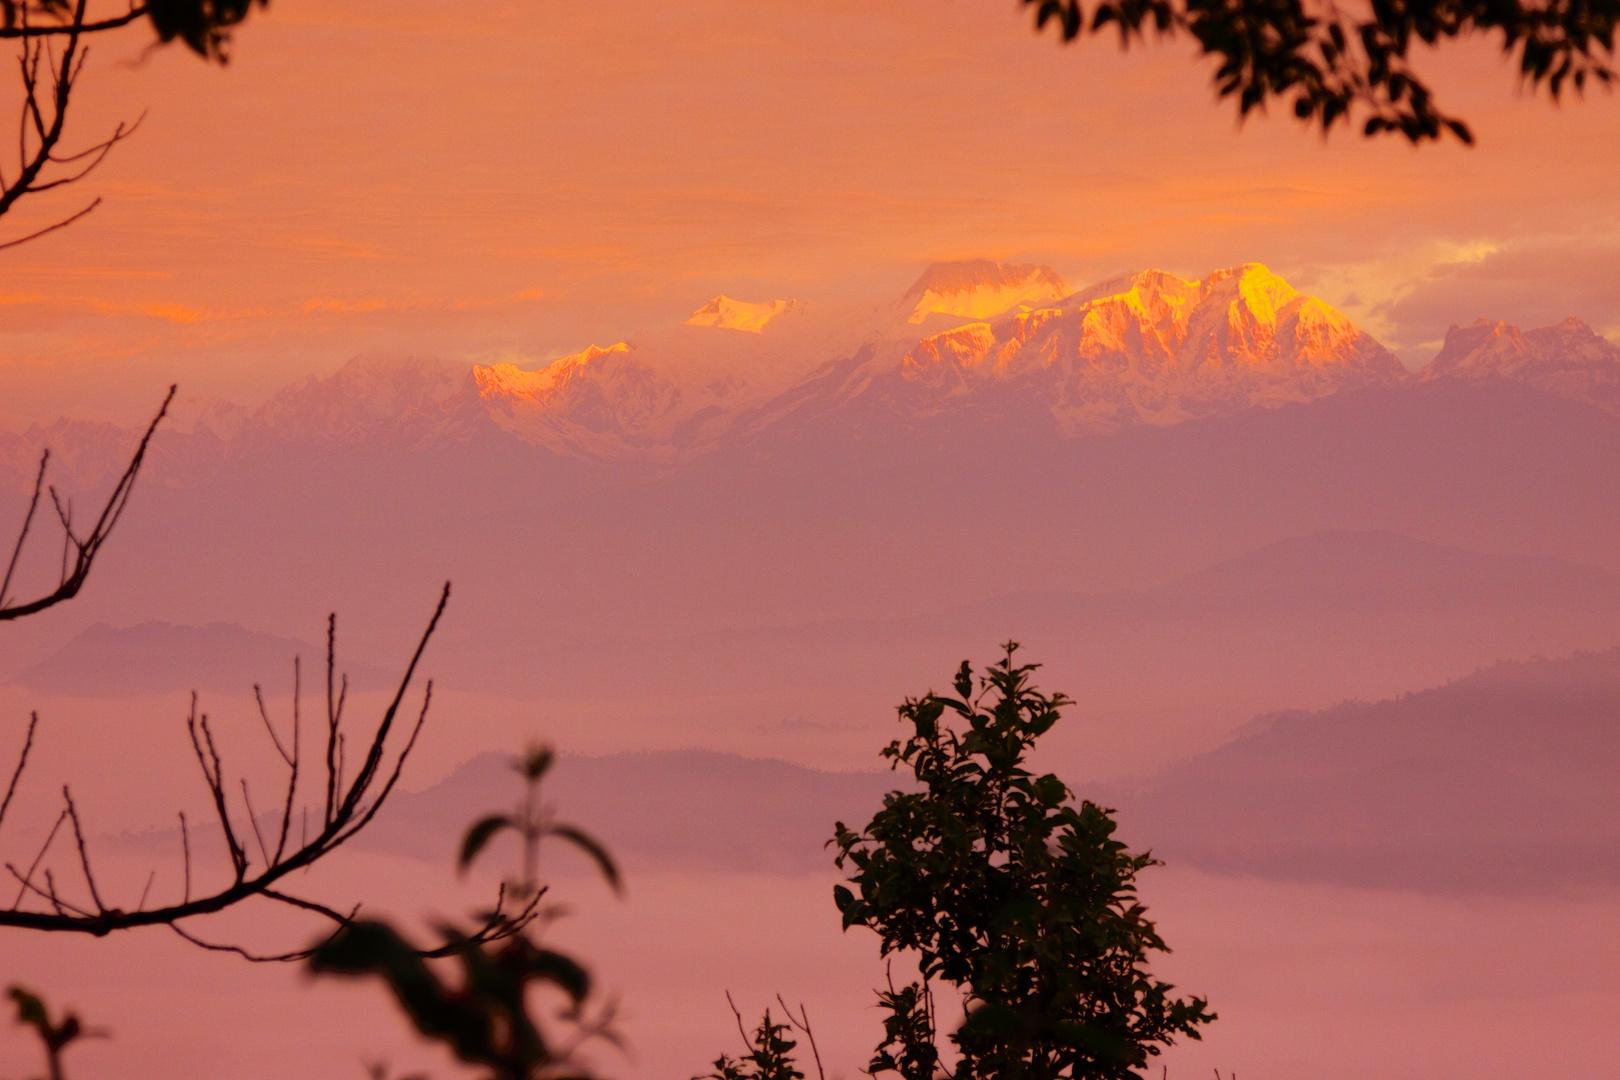 Golden Sunrise at Anapurna, Nepal